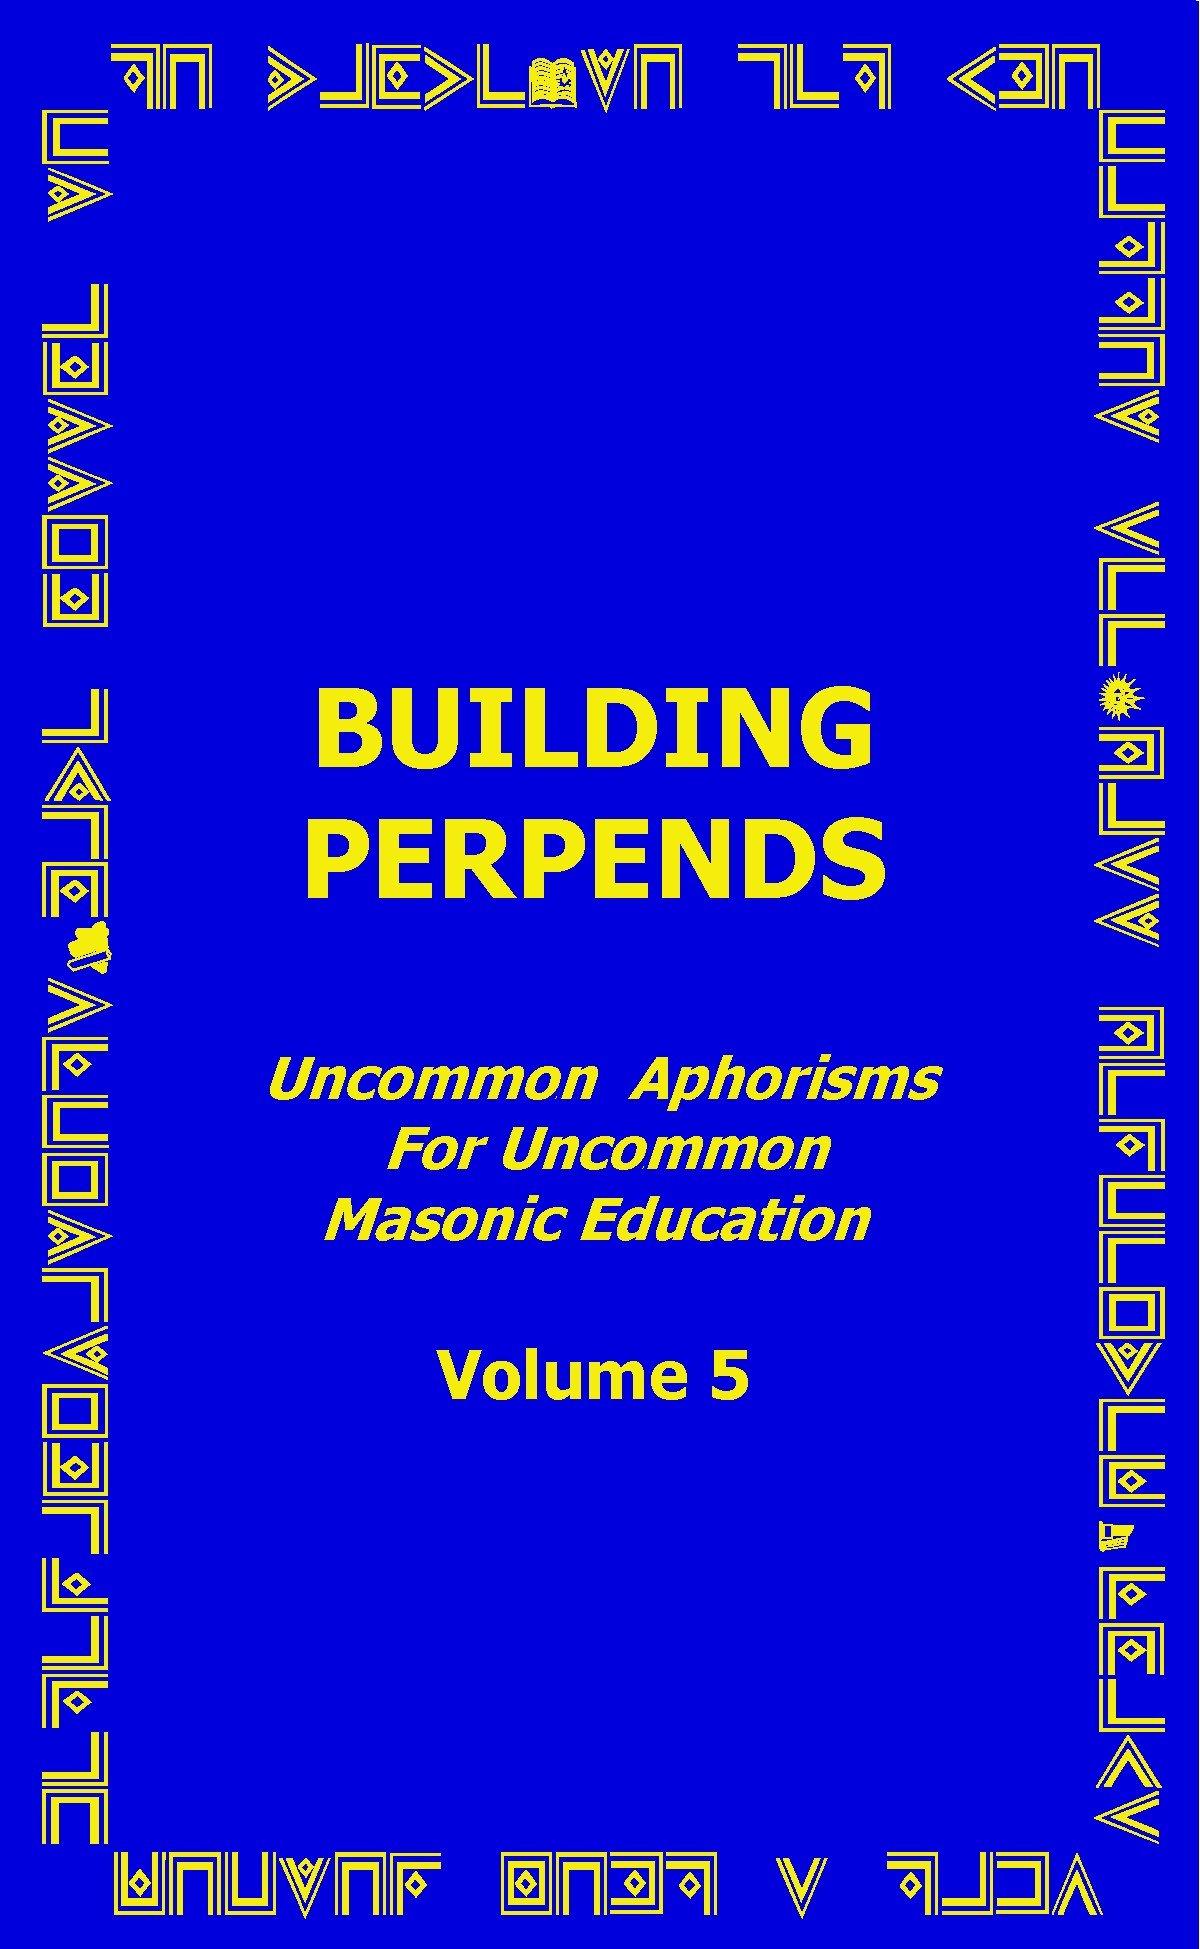 Download Building Perpends - Uncommon Aphorisms for Uncommon Masonic Education - Volume 5 PDF